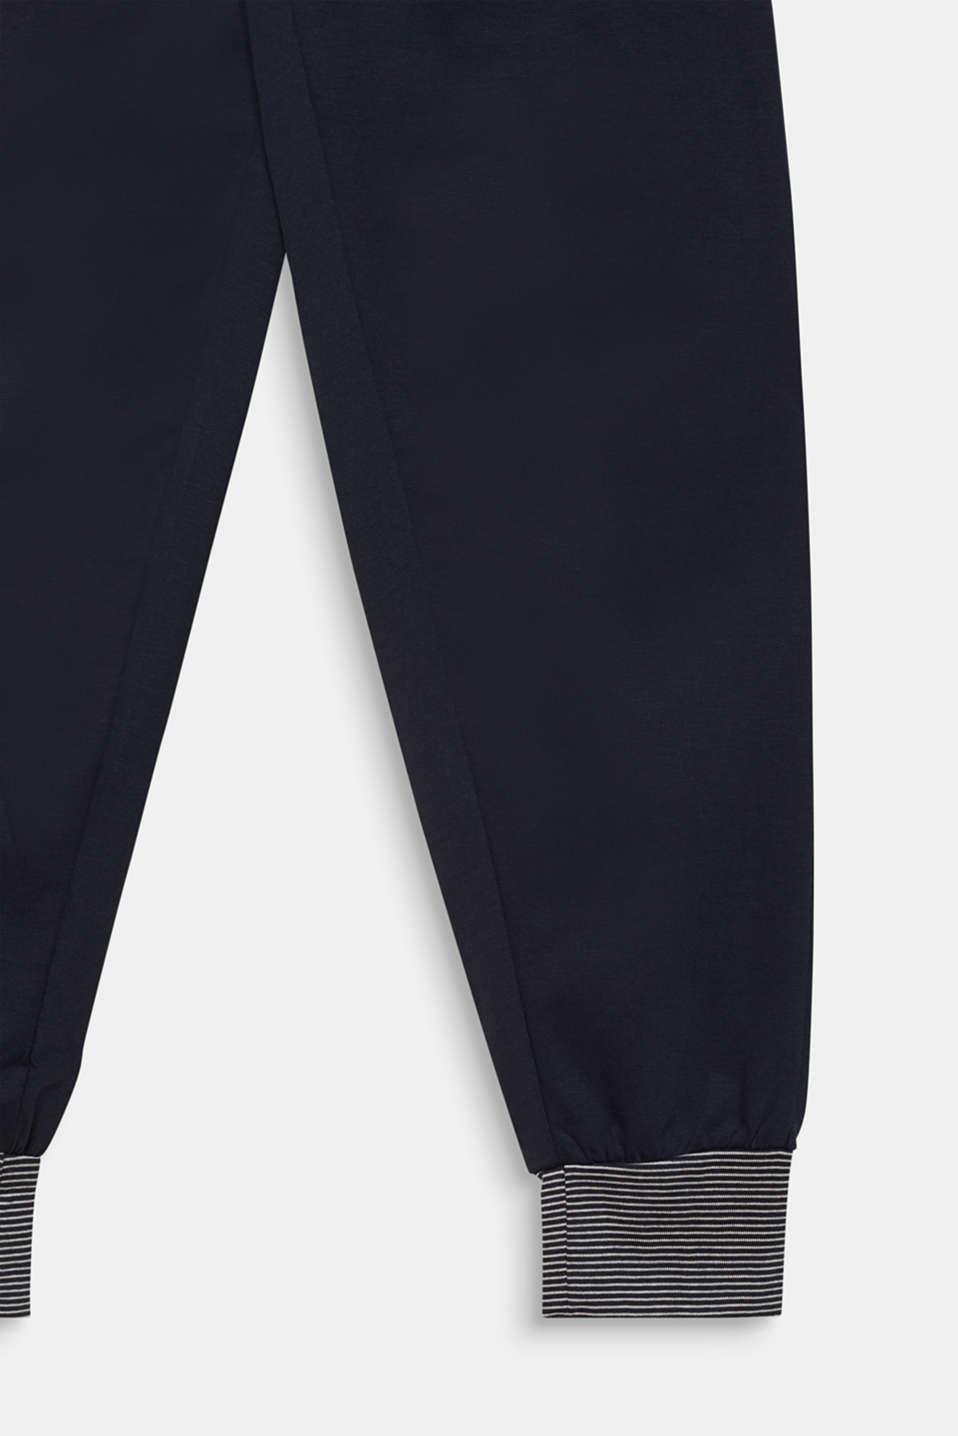 Pyjamas with a printed motif, 100% cotton, NAVY 2, detail image number 3